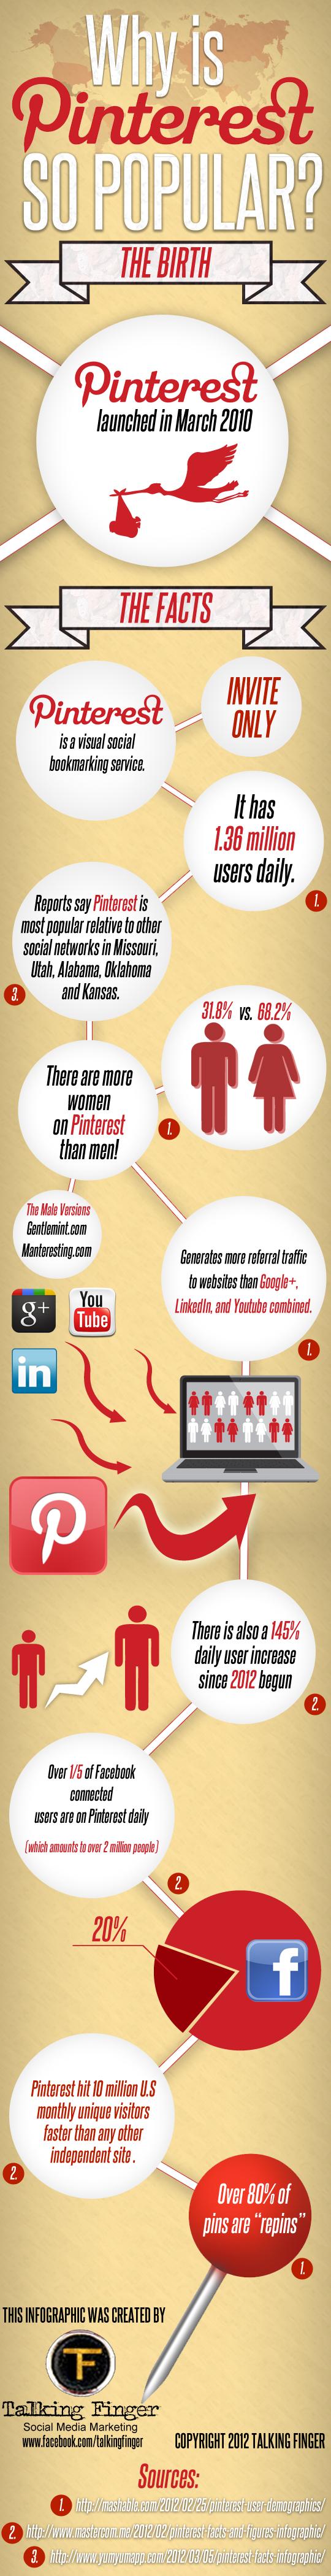 Pinterest infographic 2